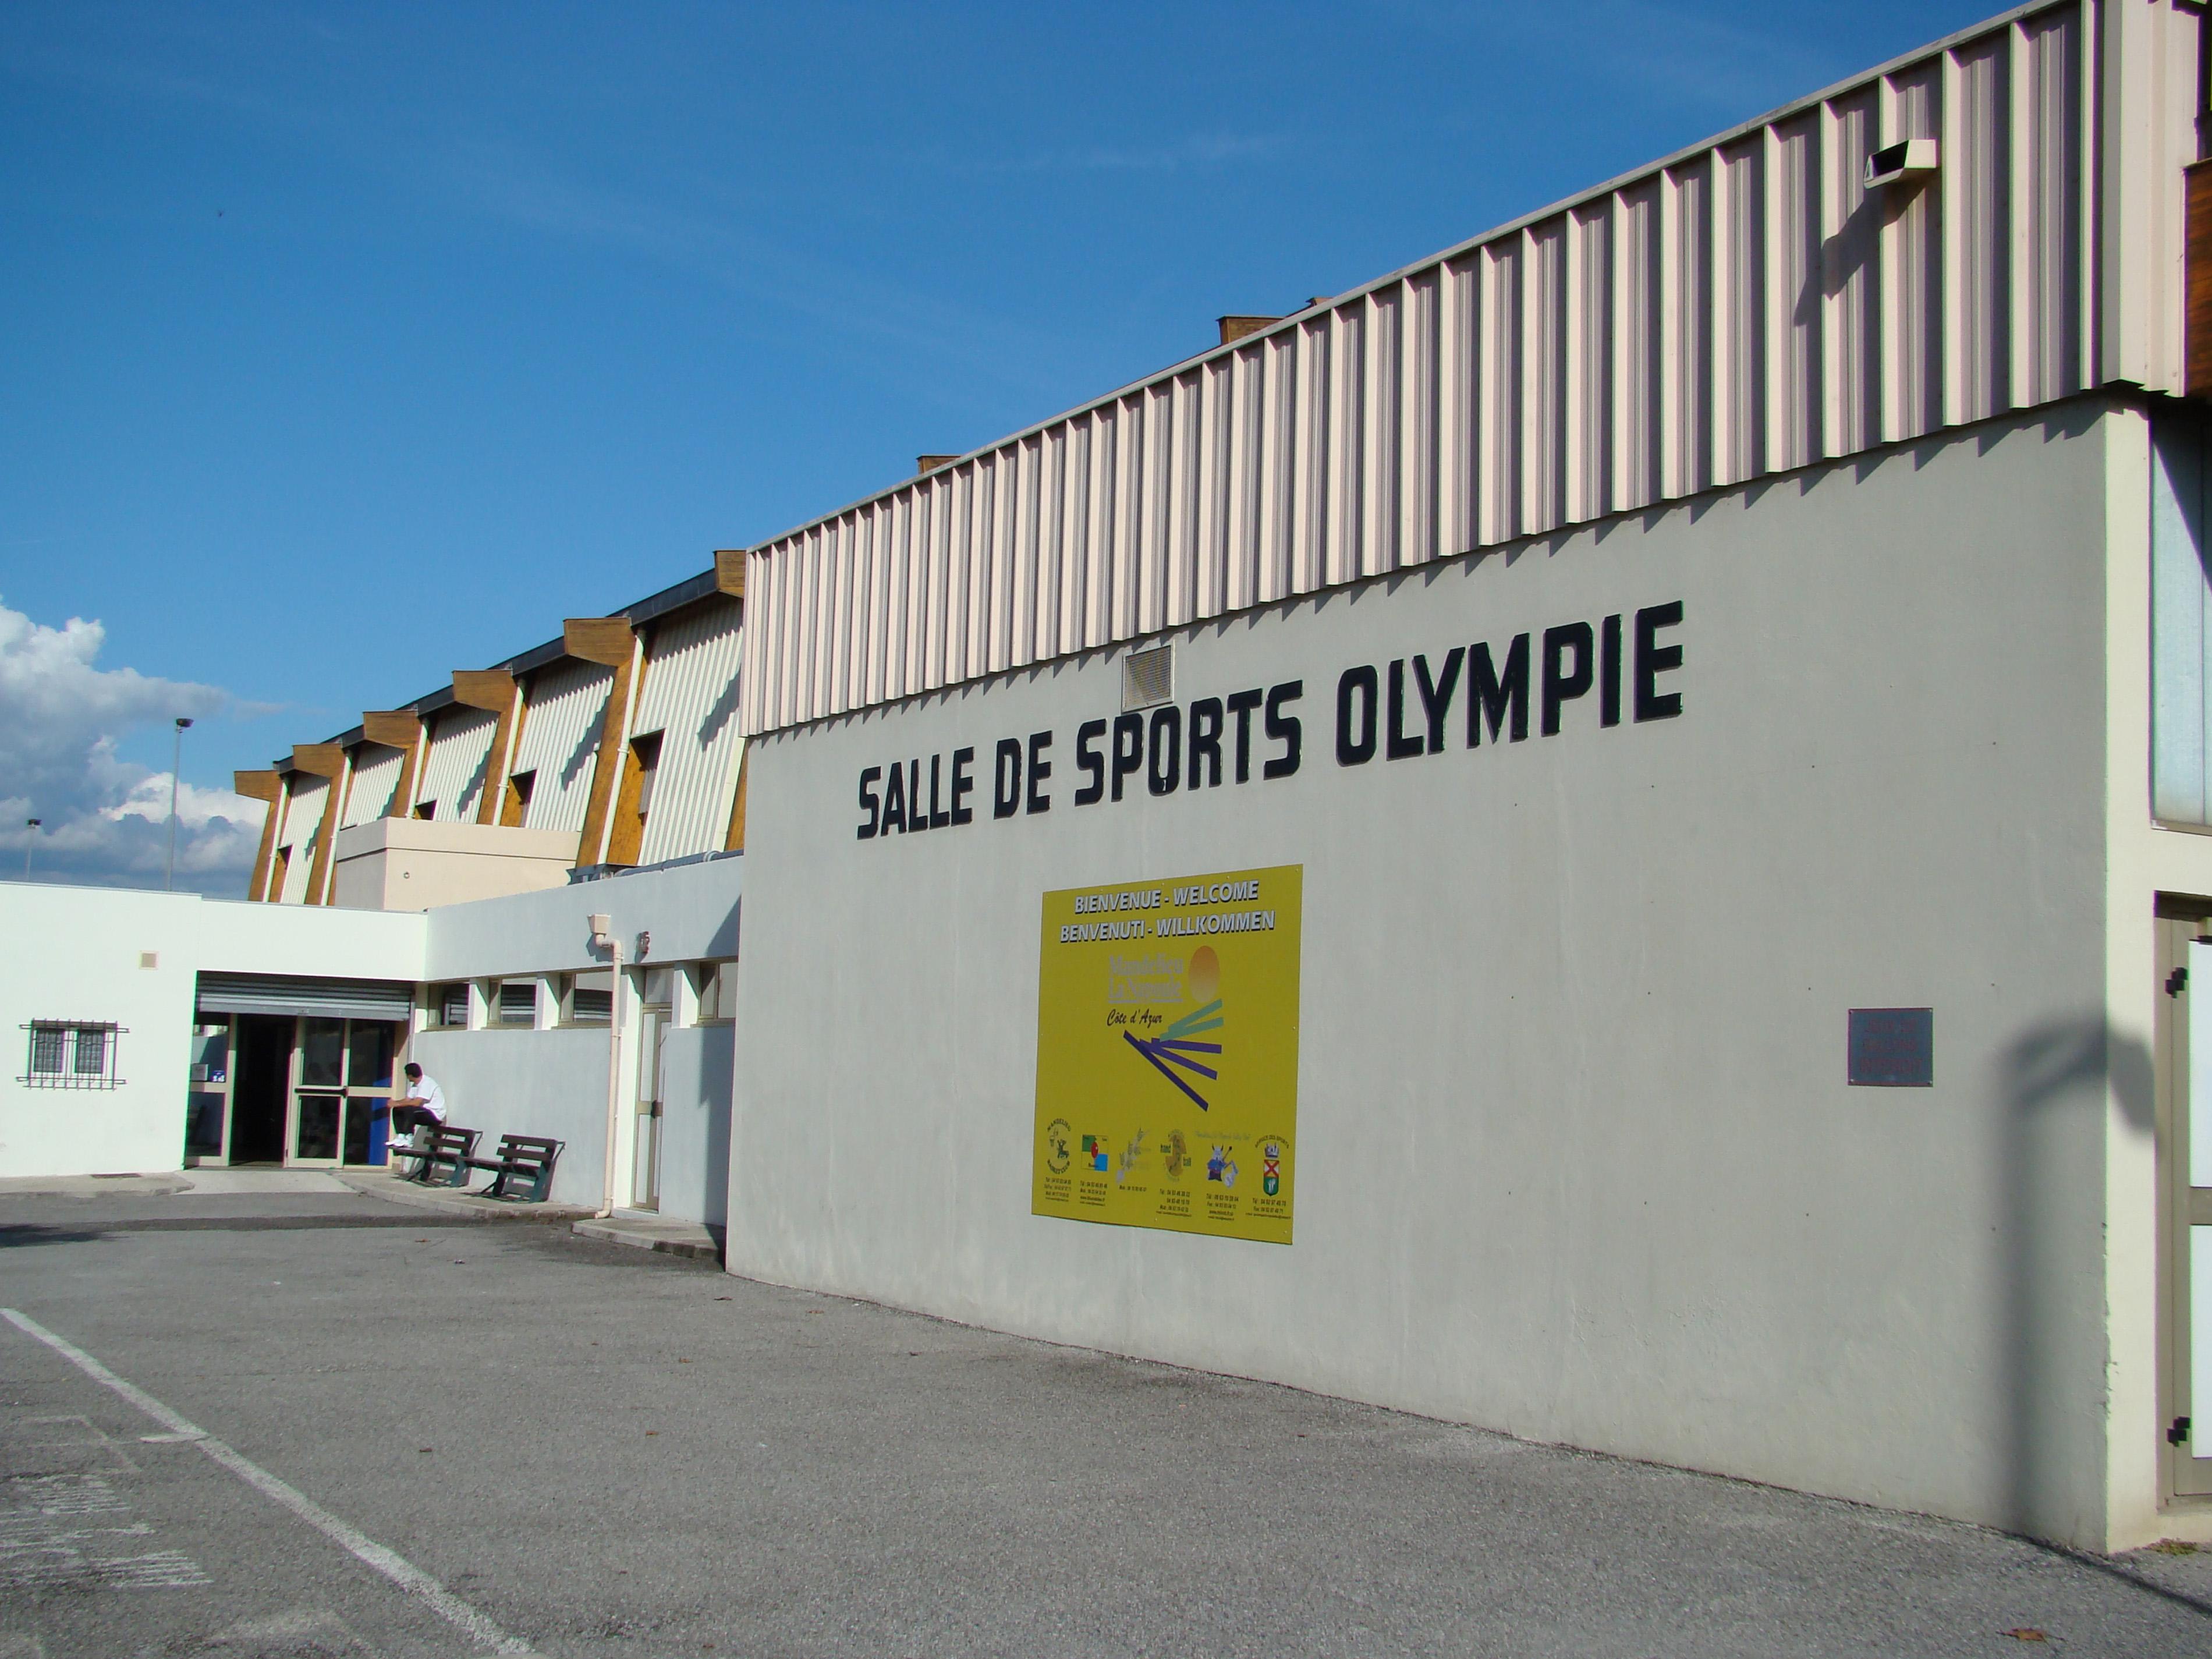 Salle Olympie